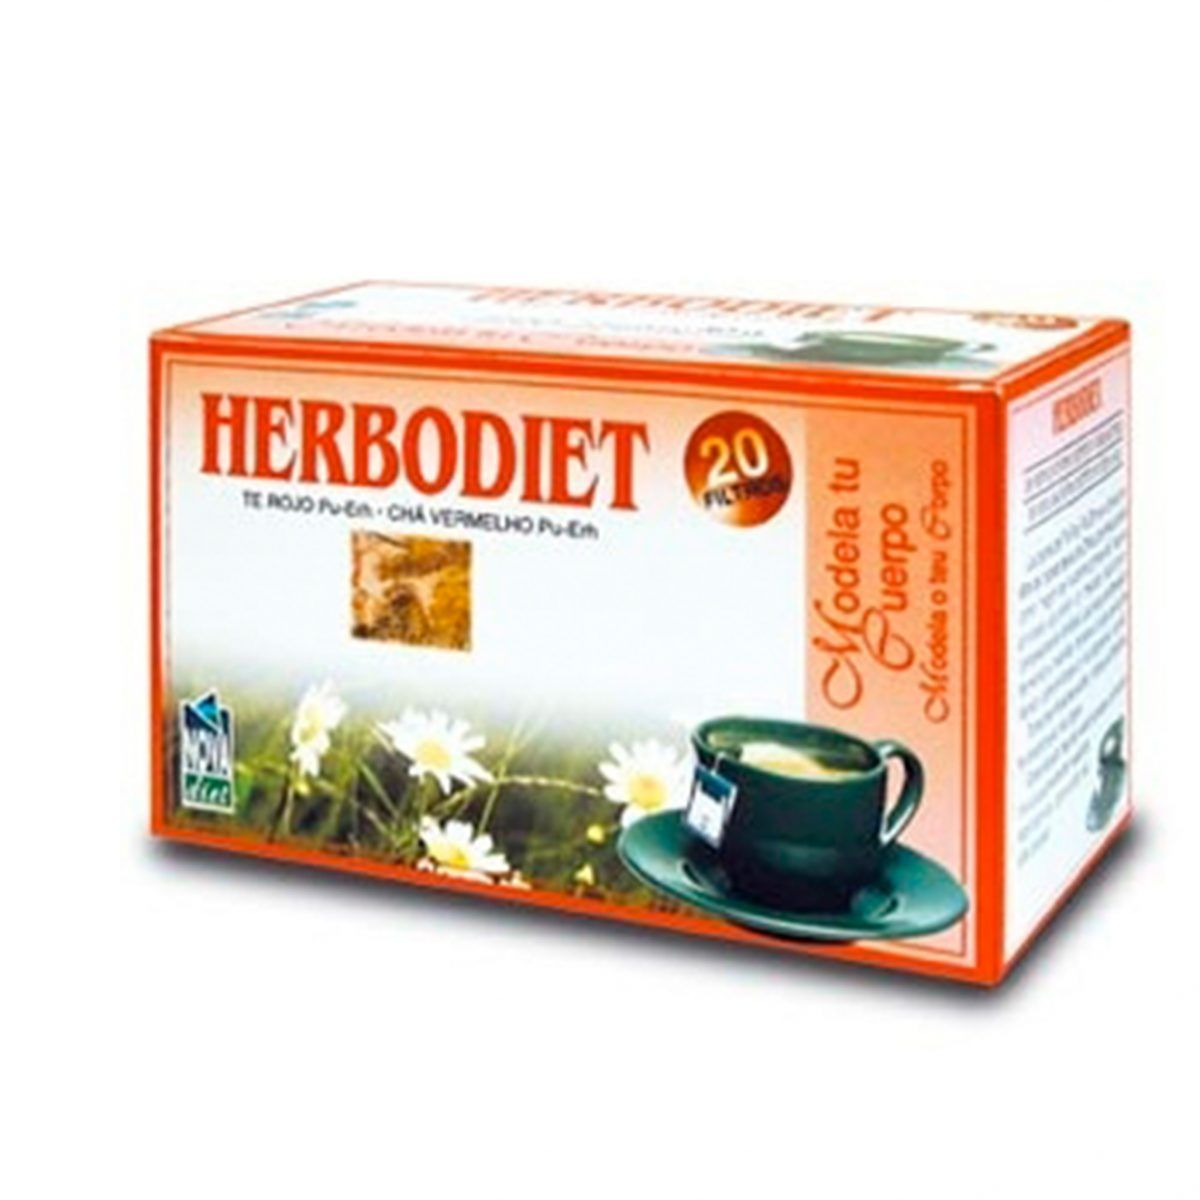 Herbodiet Modela Tu Cuerpo